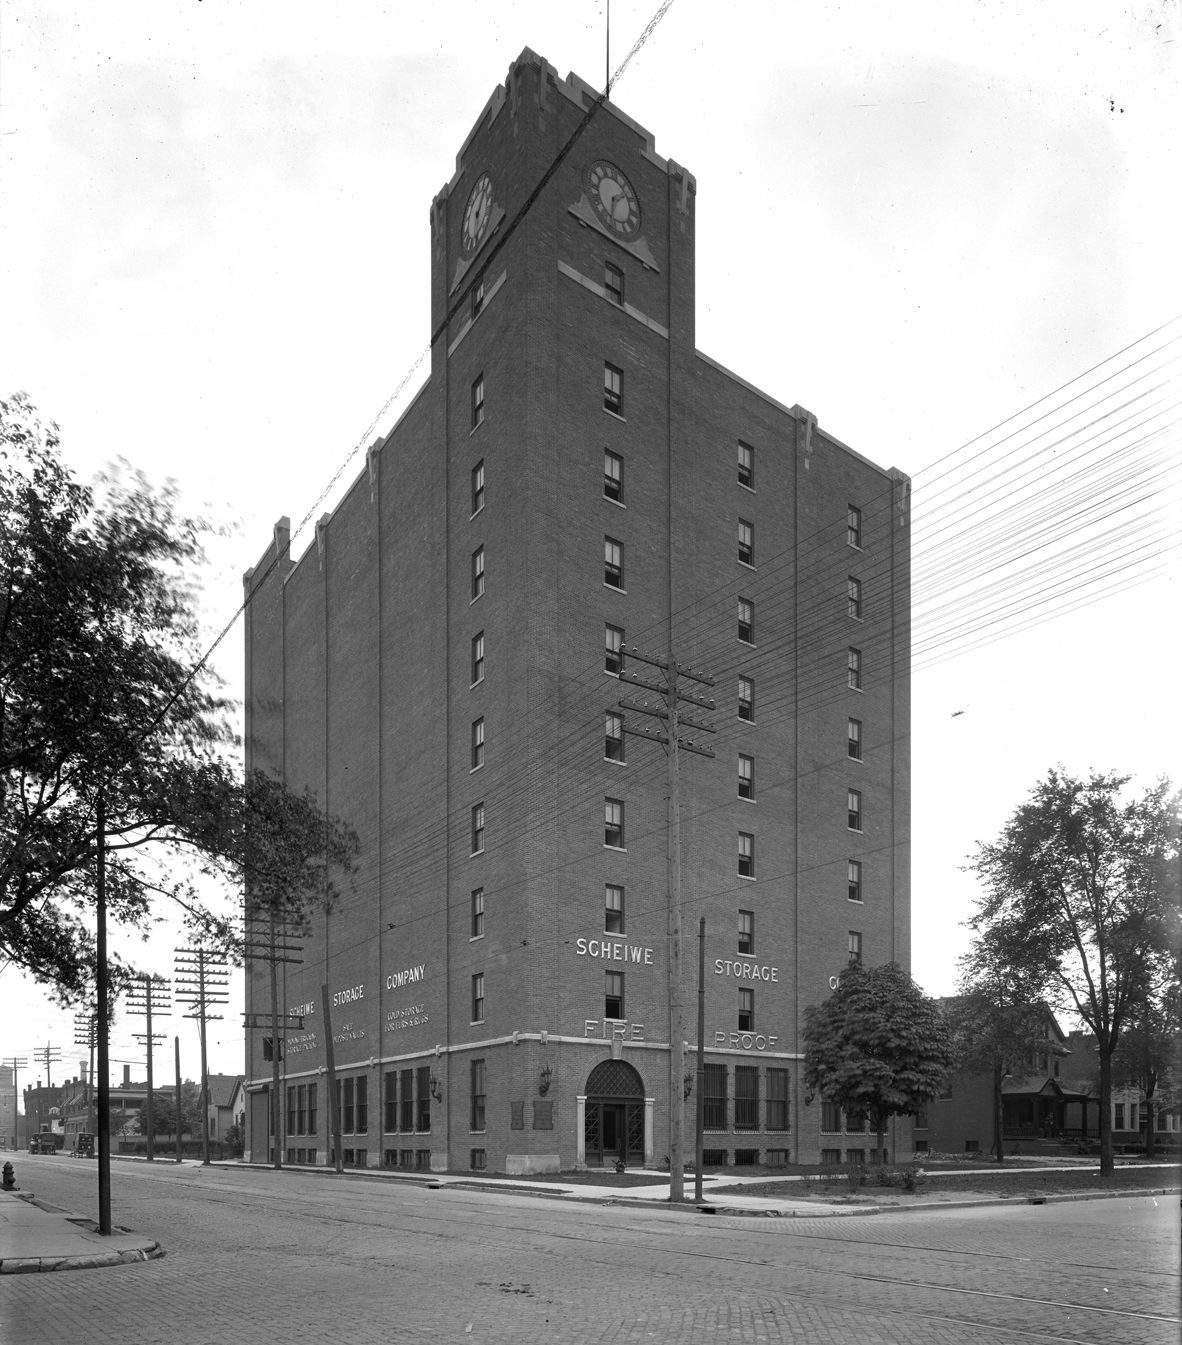 Historic image of Chroma building